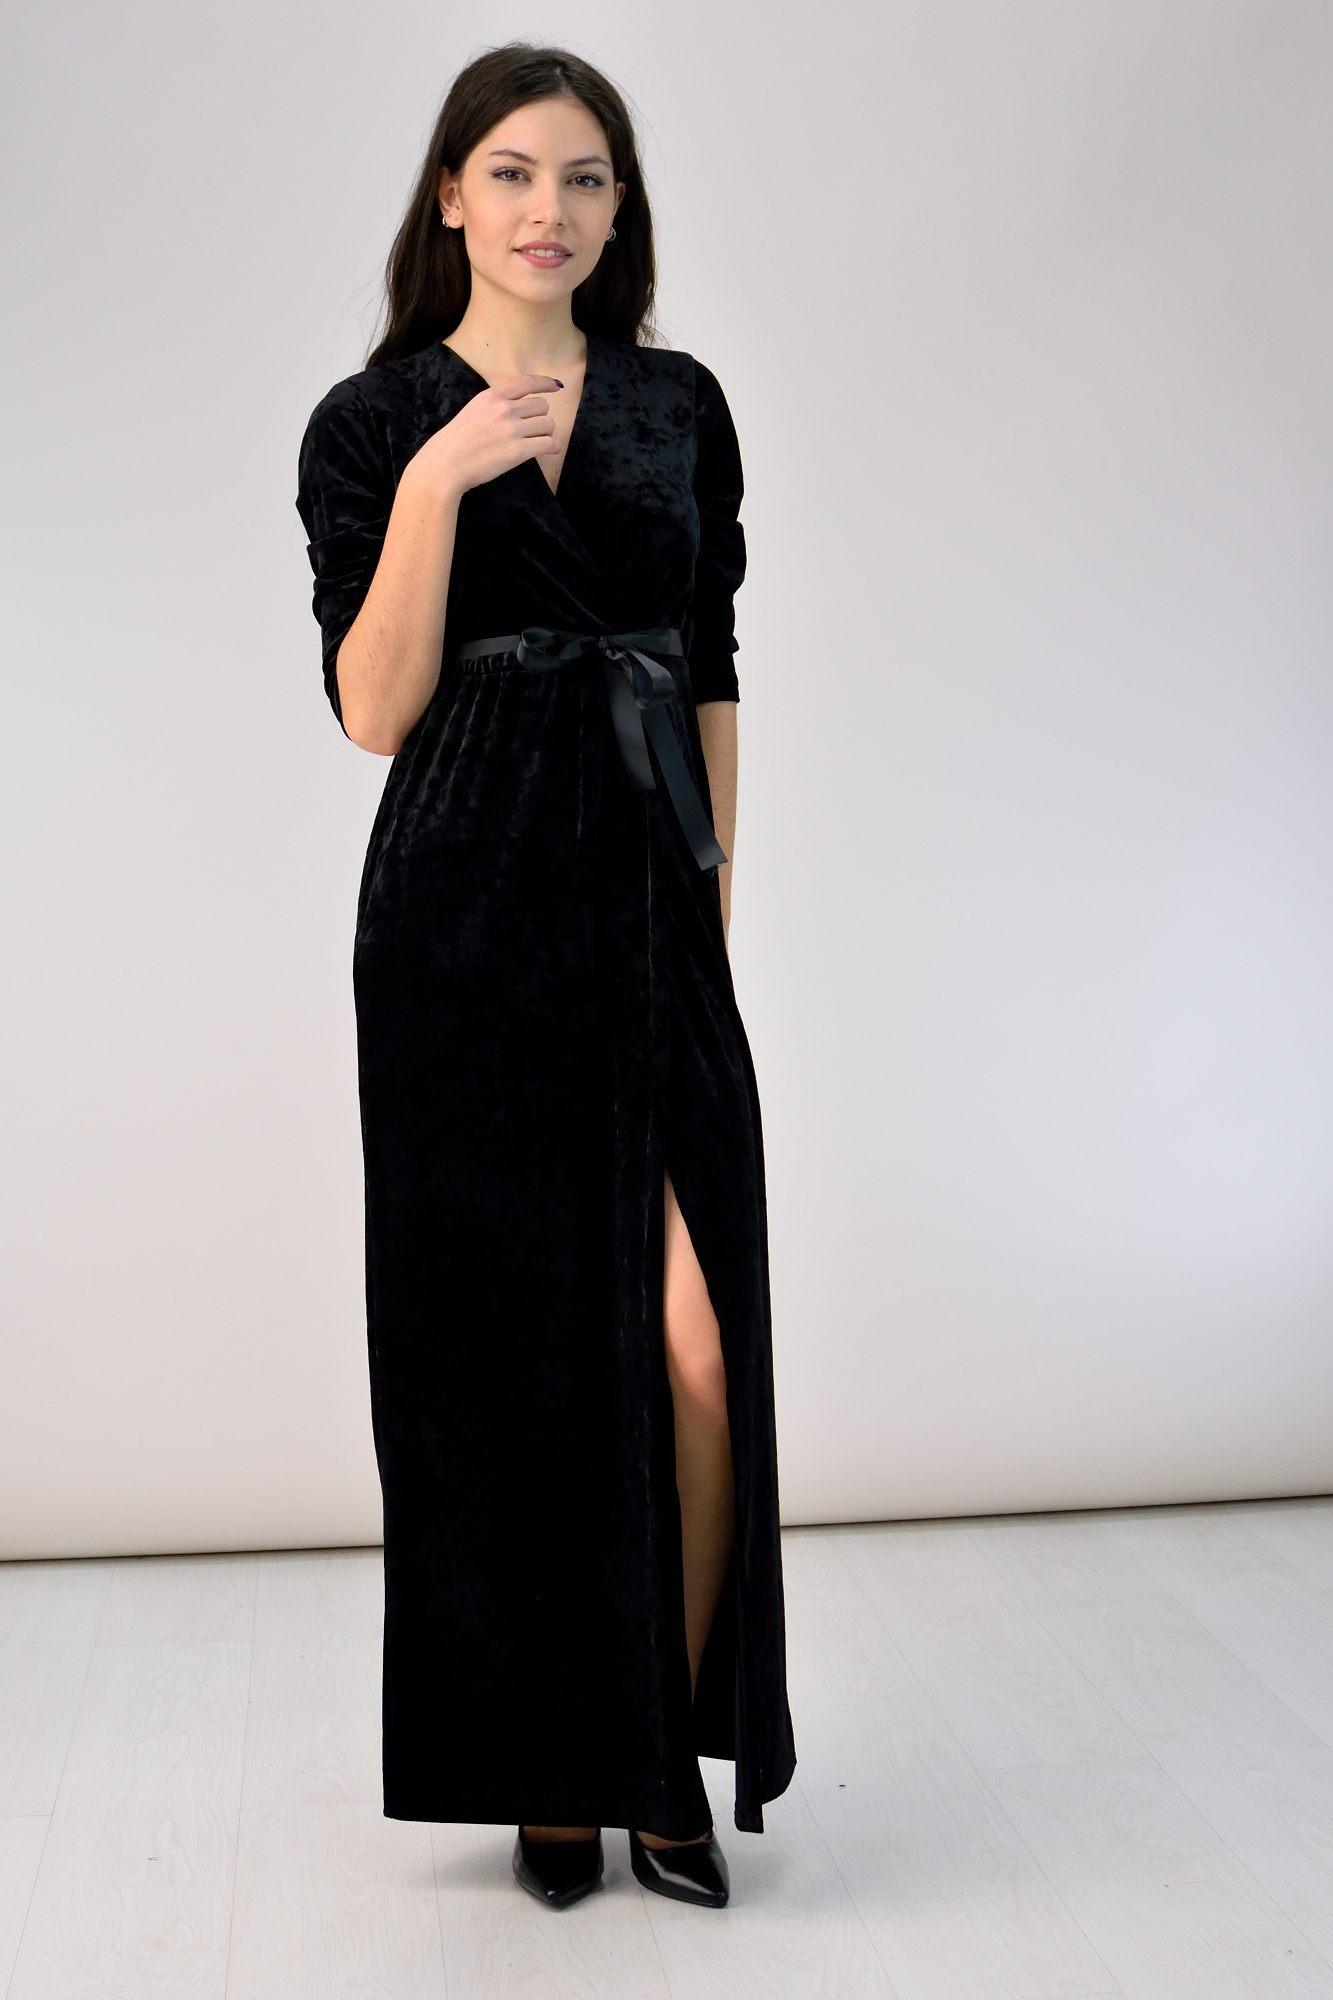 6a52cb459136 Κρουαζέ φόρεμα από βελούδο μαύρο - ΦΟΡΕΜΑΤΑ